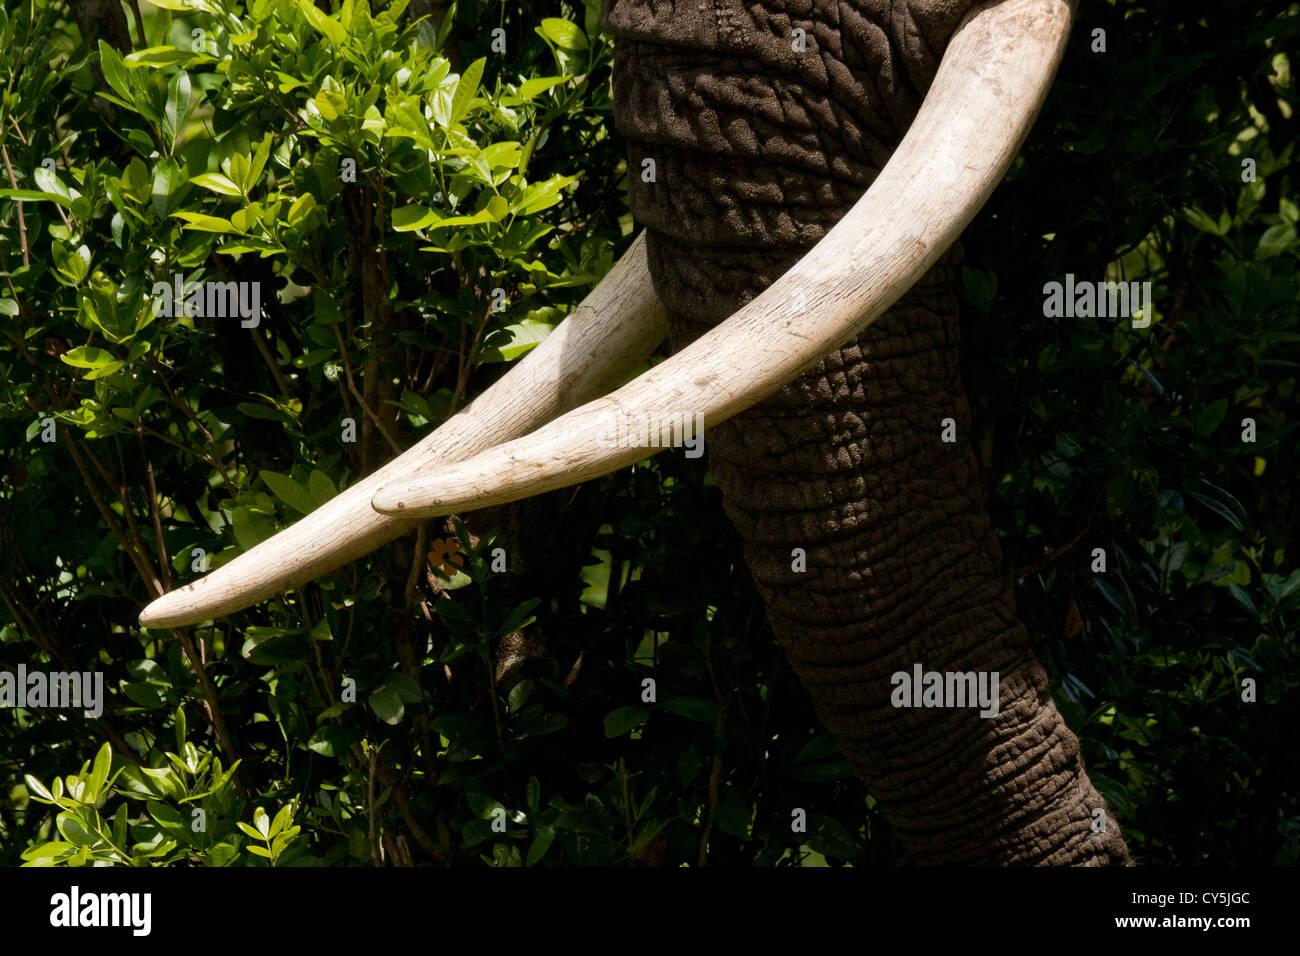 African Bush Elephant (Loxodonta africana) in close to Tusks on the Masai Mara National Reserve, Kenya - Stock Image